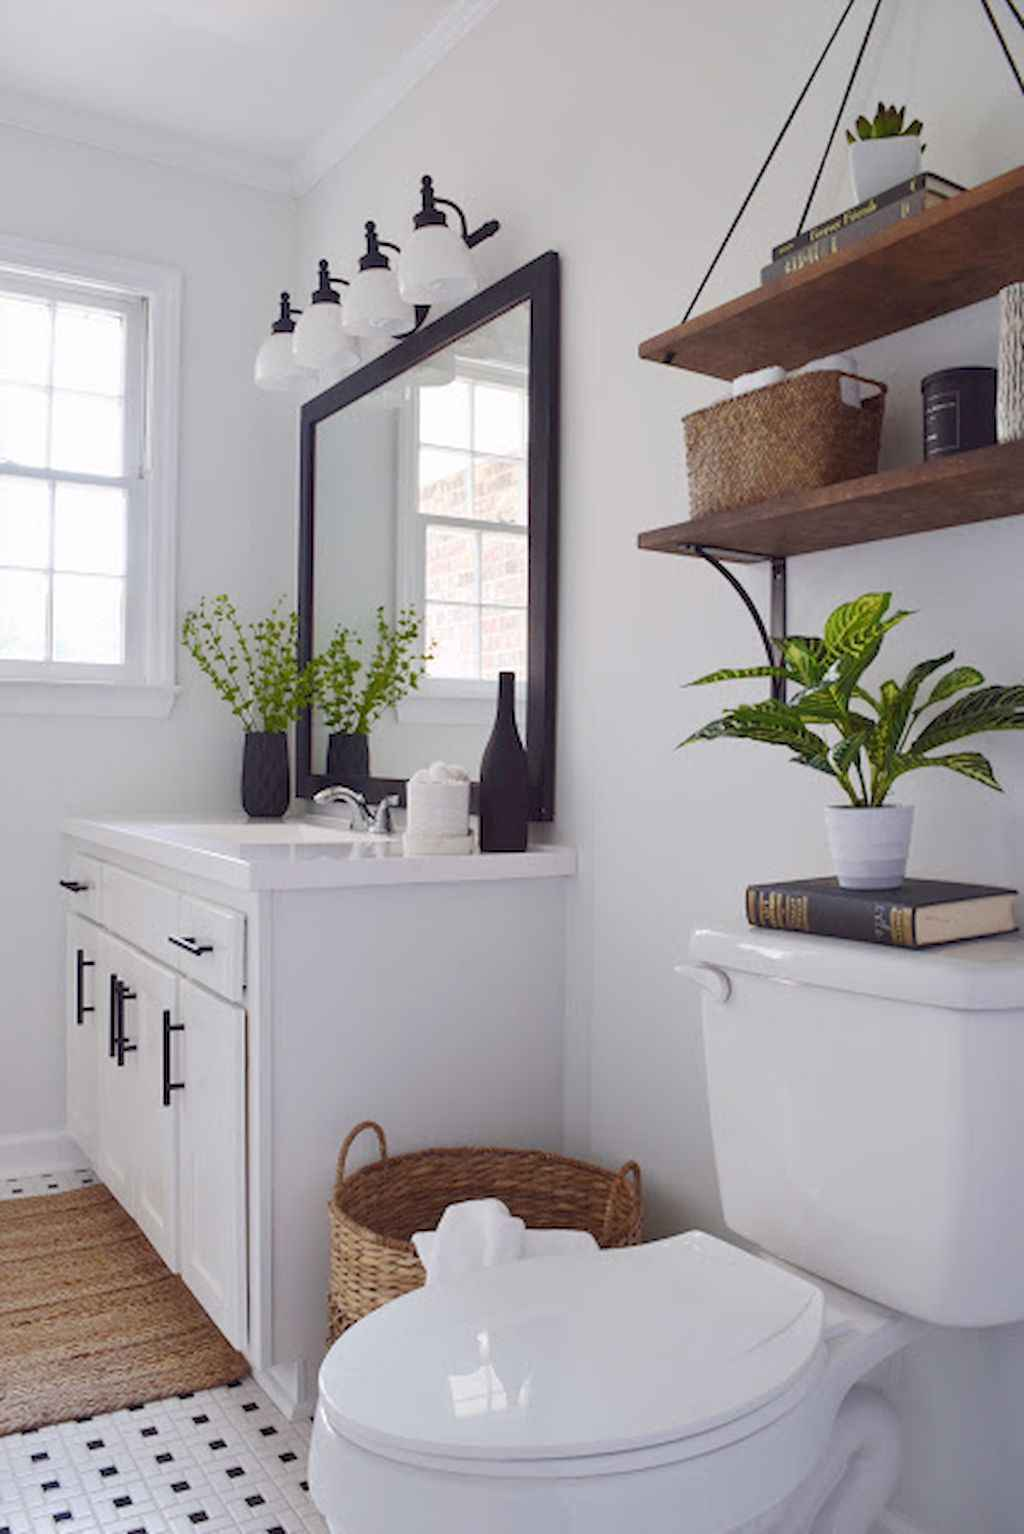 50 Rustic Farmhouse Master Bathroom Remodel Ideas (29) - Roomadness